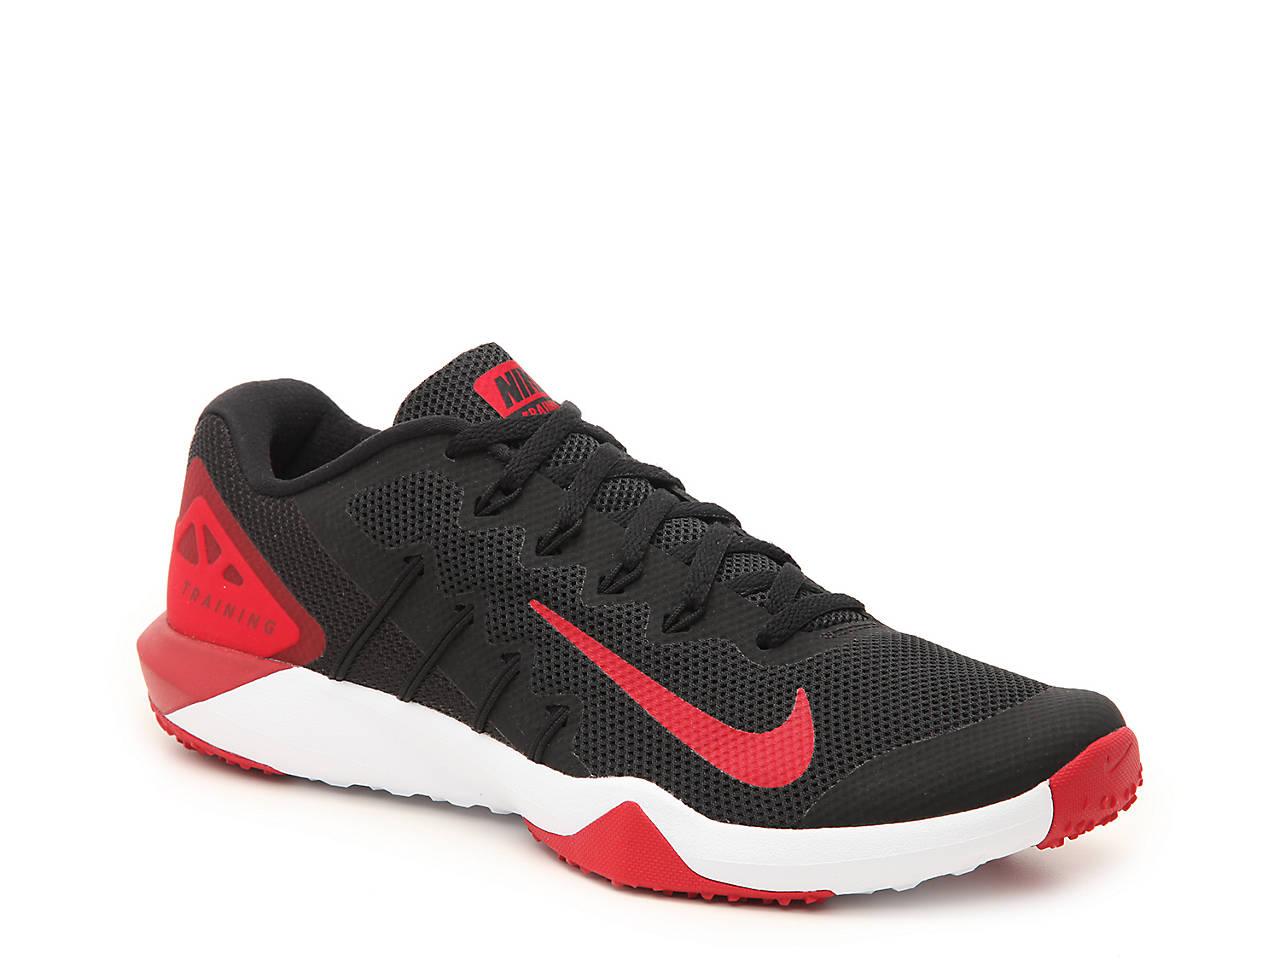 promo code 6dacd 4e871 Nike Retaliation 2 Performance Training Shoe - Men s Men s Shoes   DSW